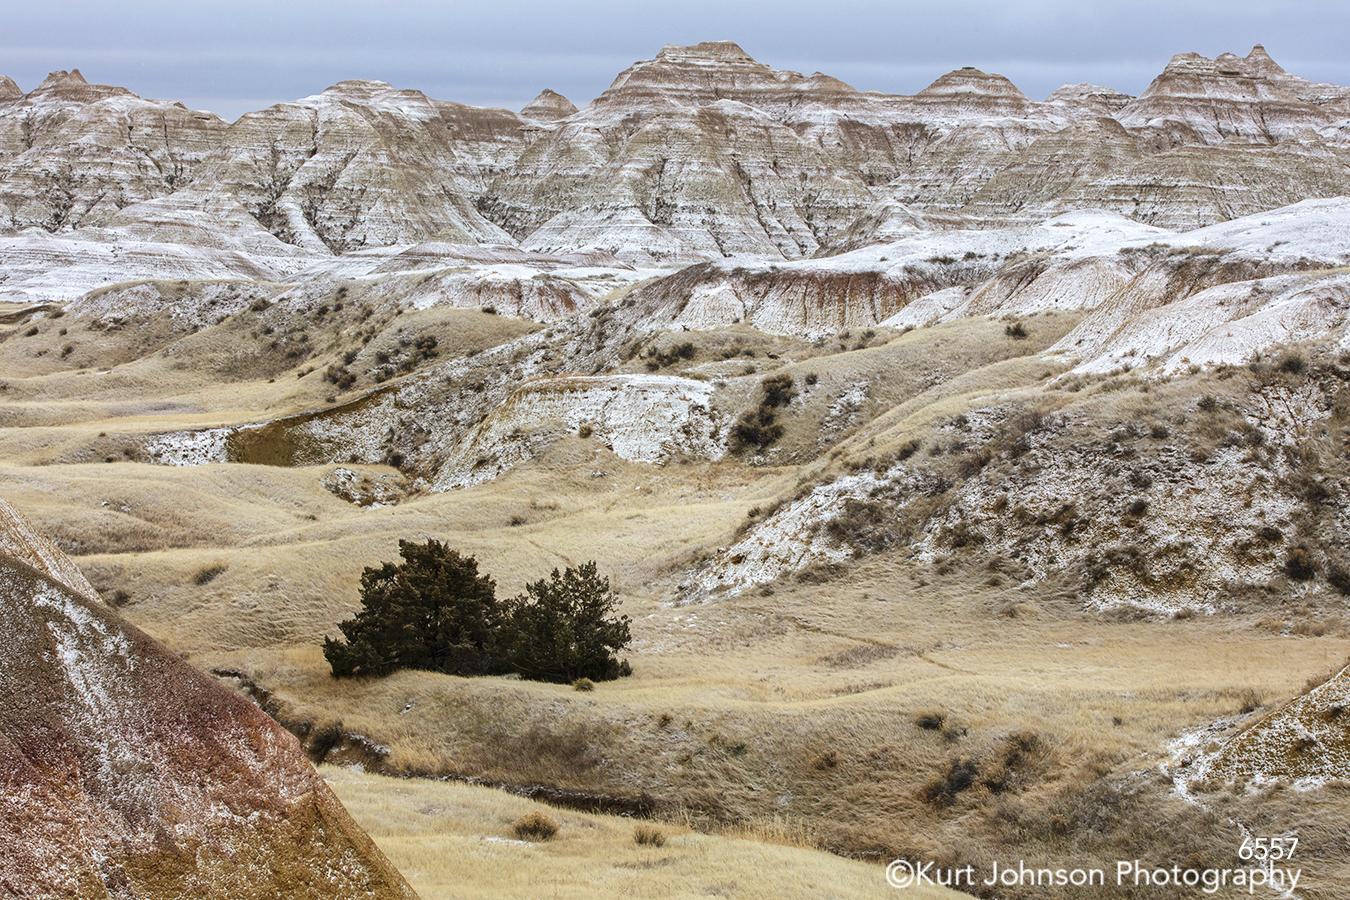 Badlands South Dakota Dakotas mountains trees landscape brown tan beige snow winter